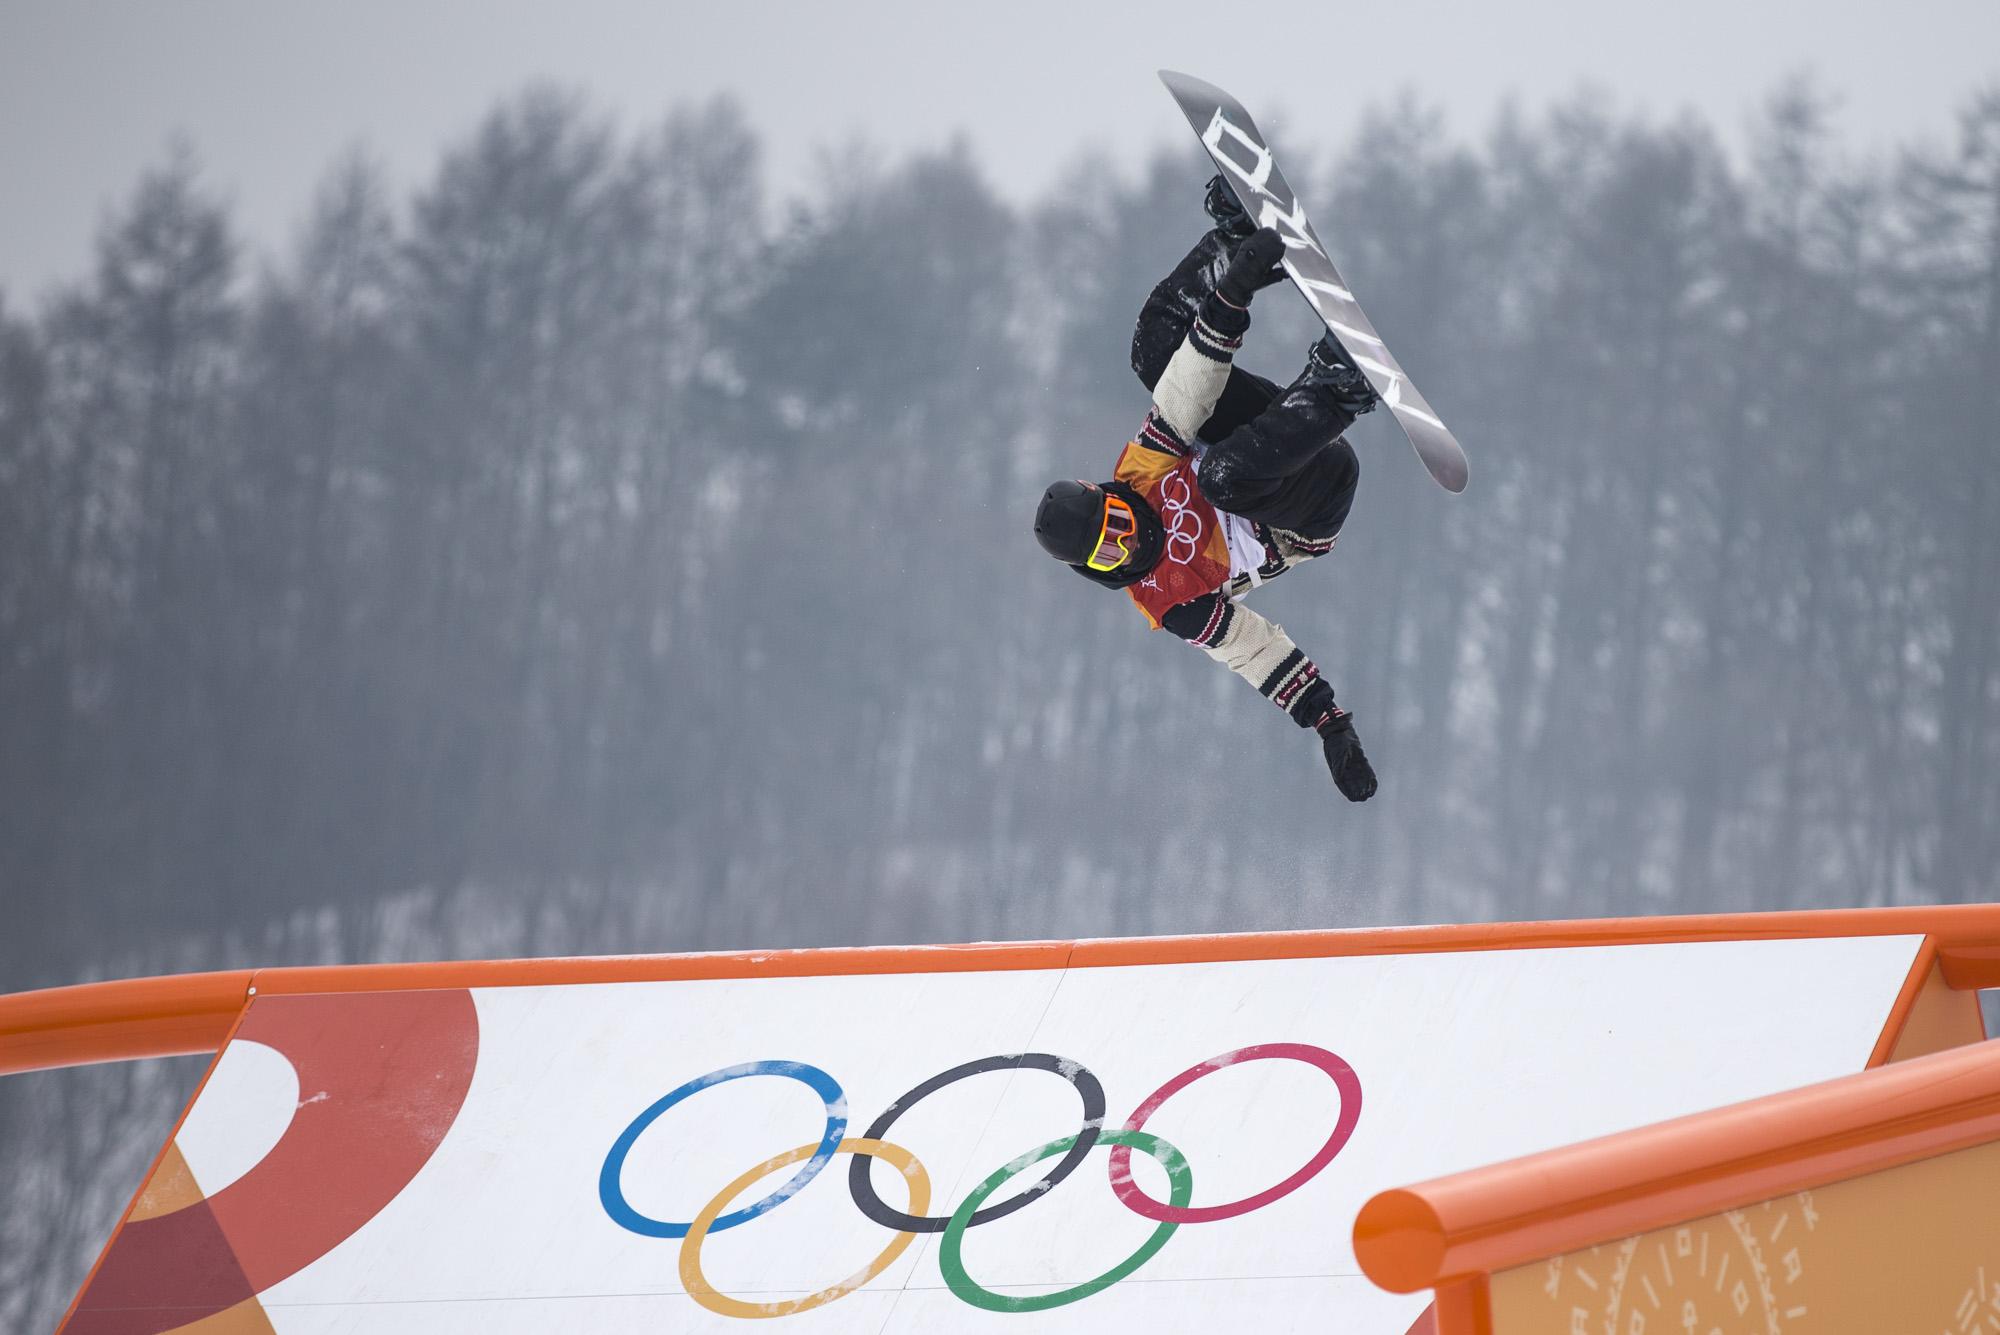 Team Canada Sebastien Toutant PyeongChang 2018 Slopestyle Qualifying